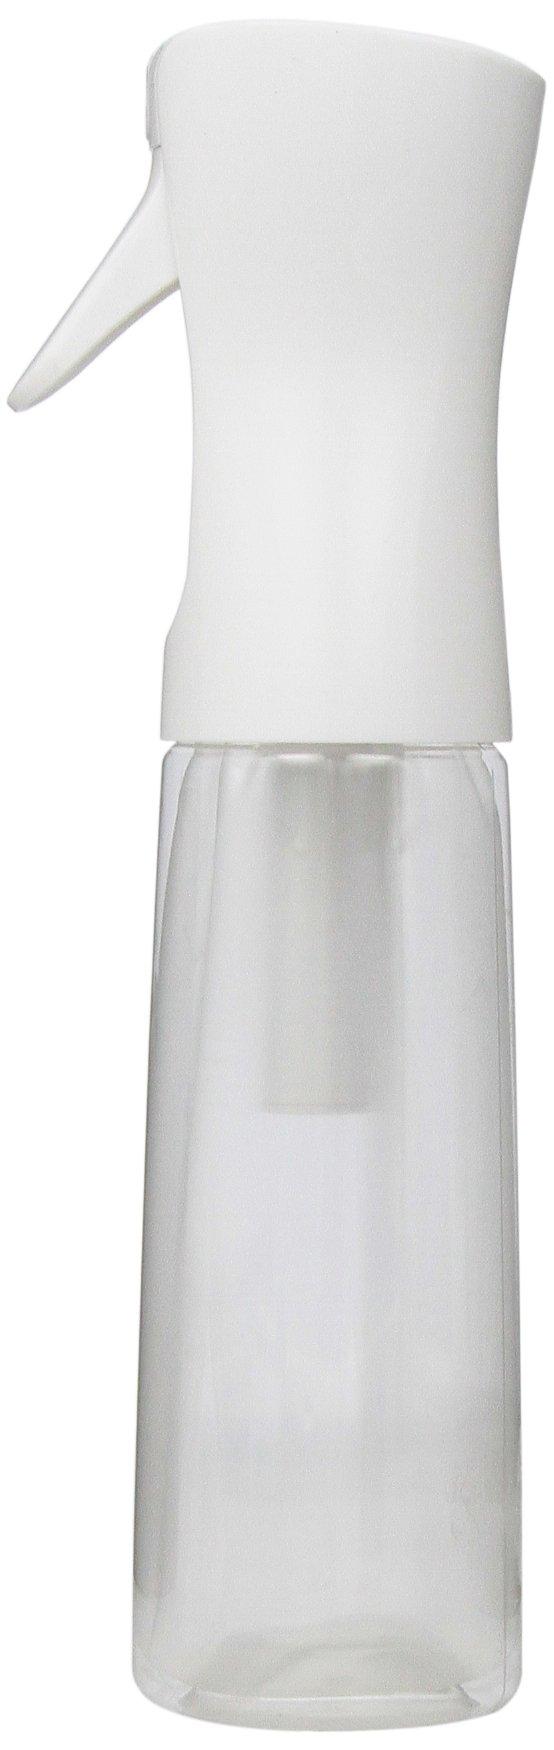 Groom Industries Solvent Free Sprayer, Flairosol